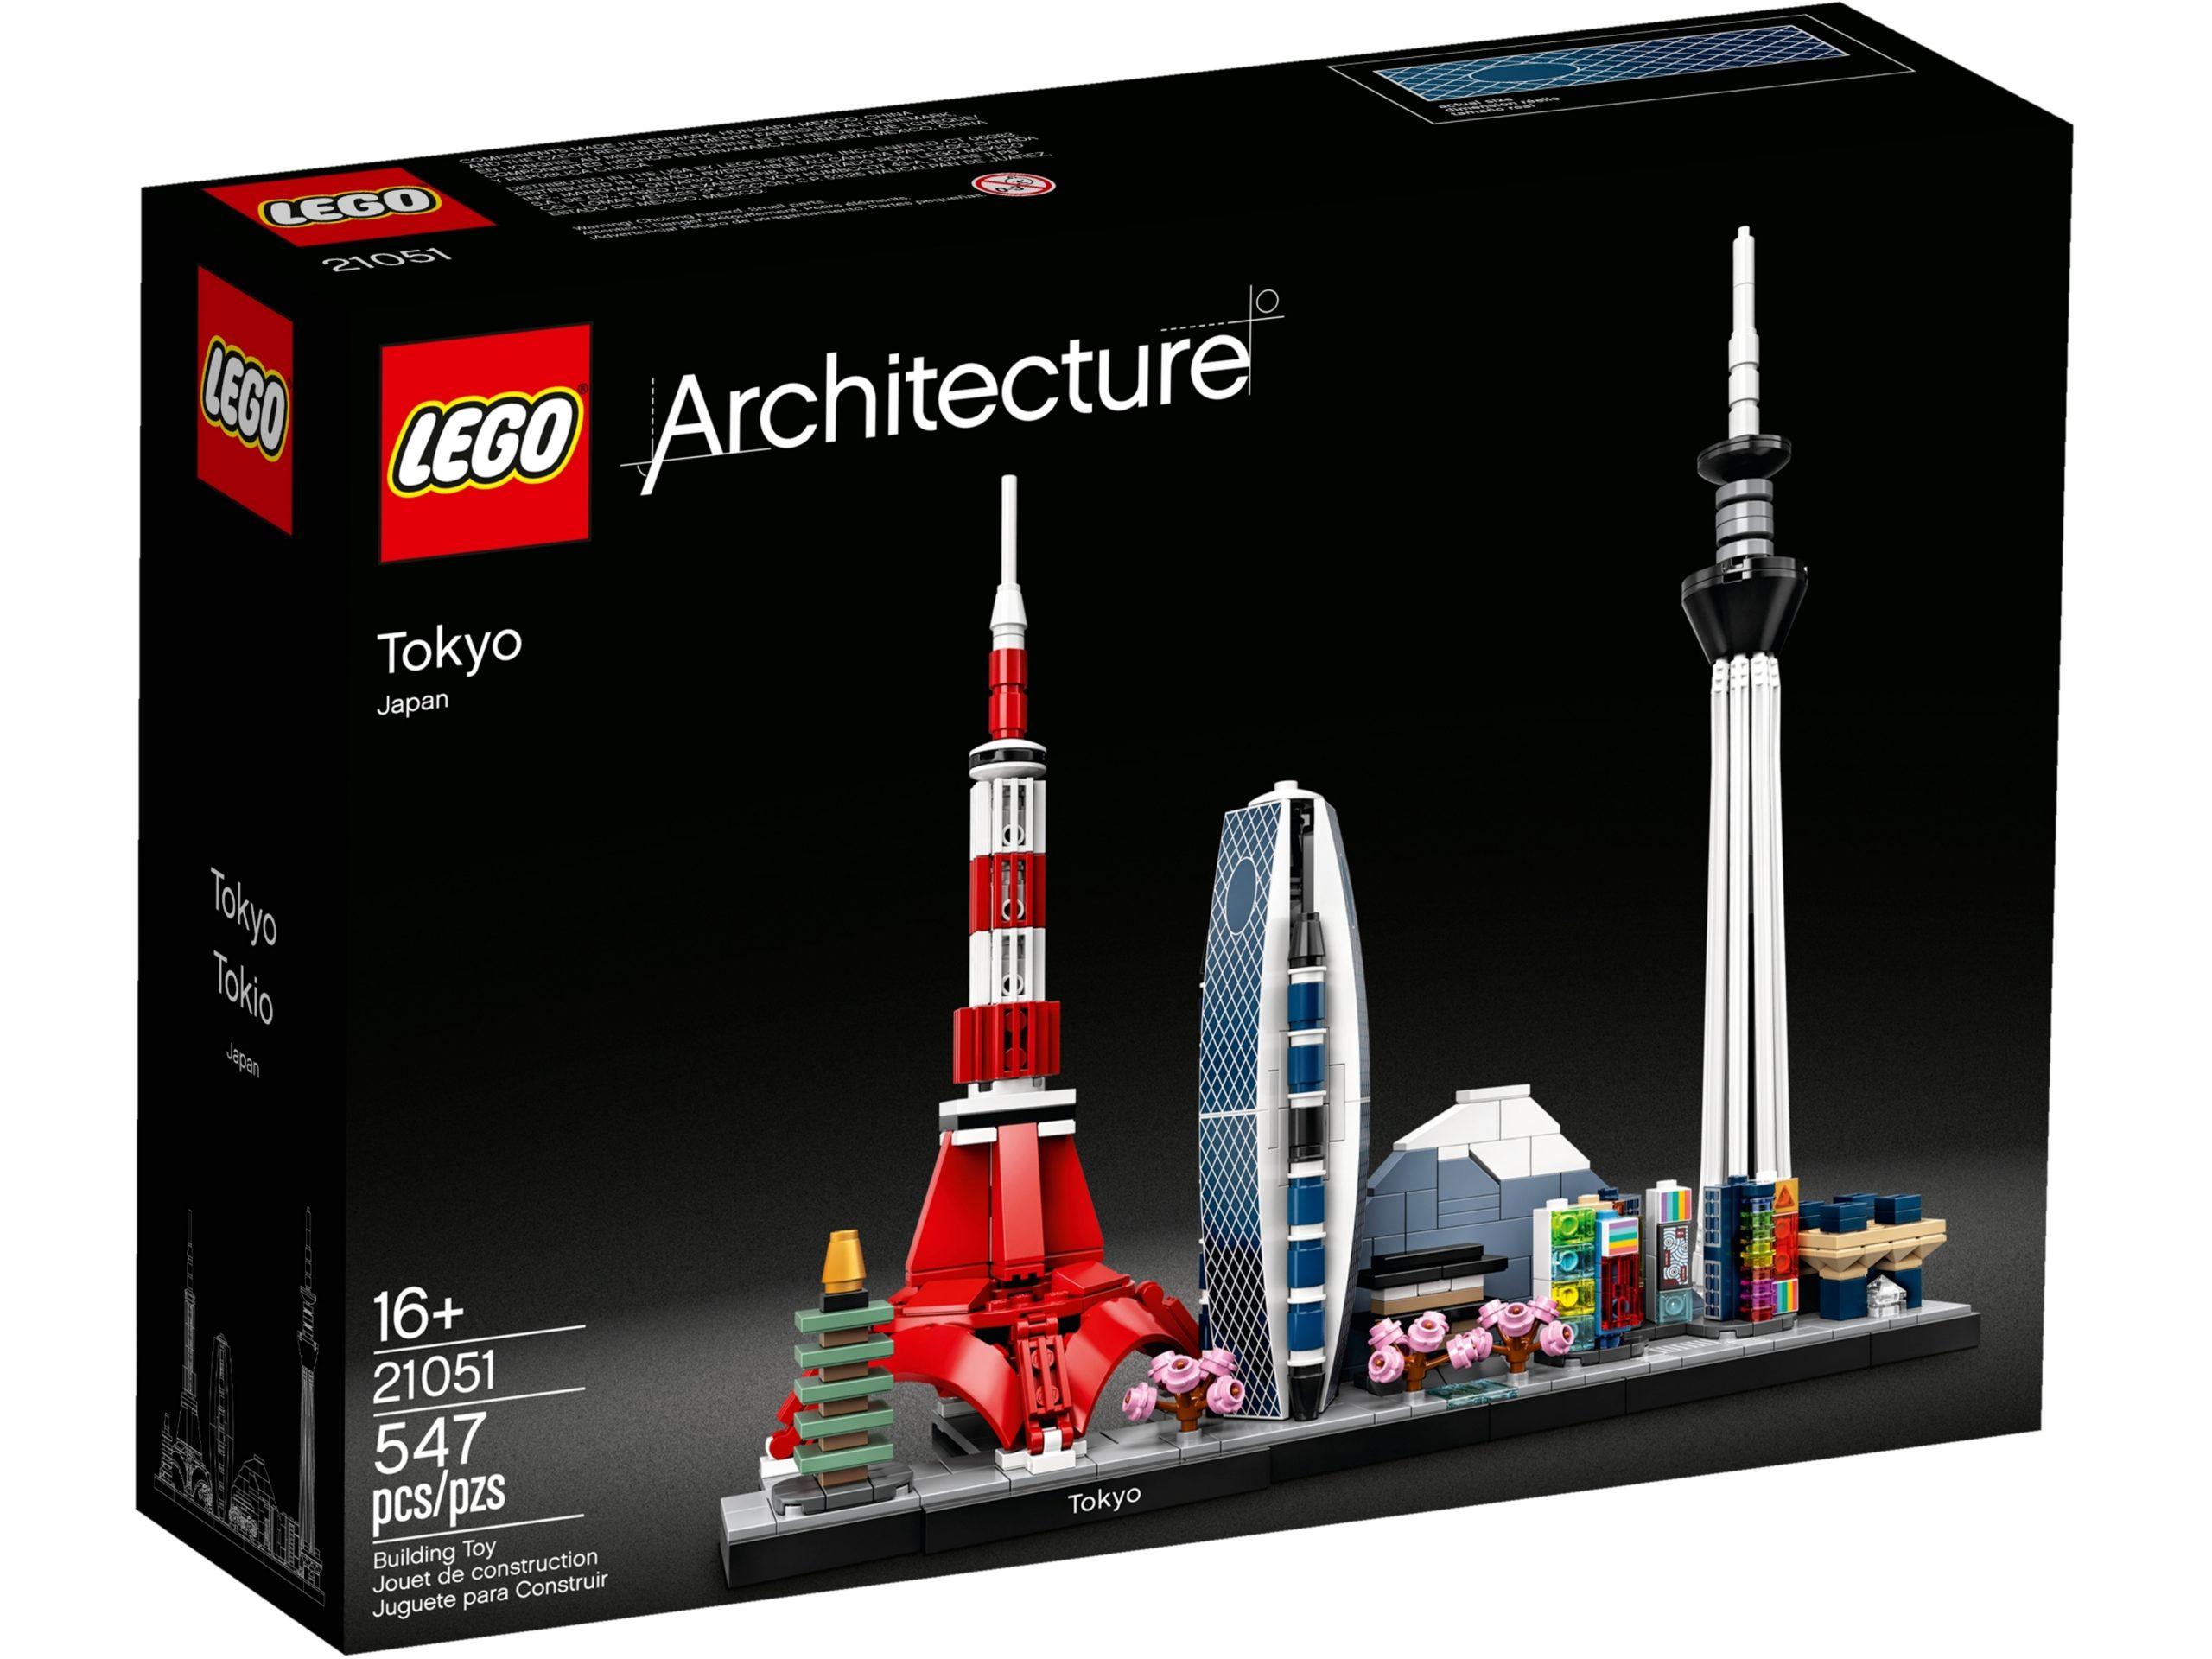 lego 21051 tokyo scaled